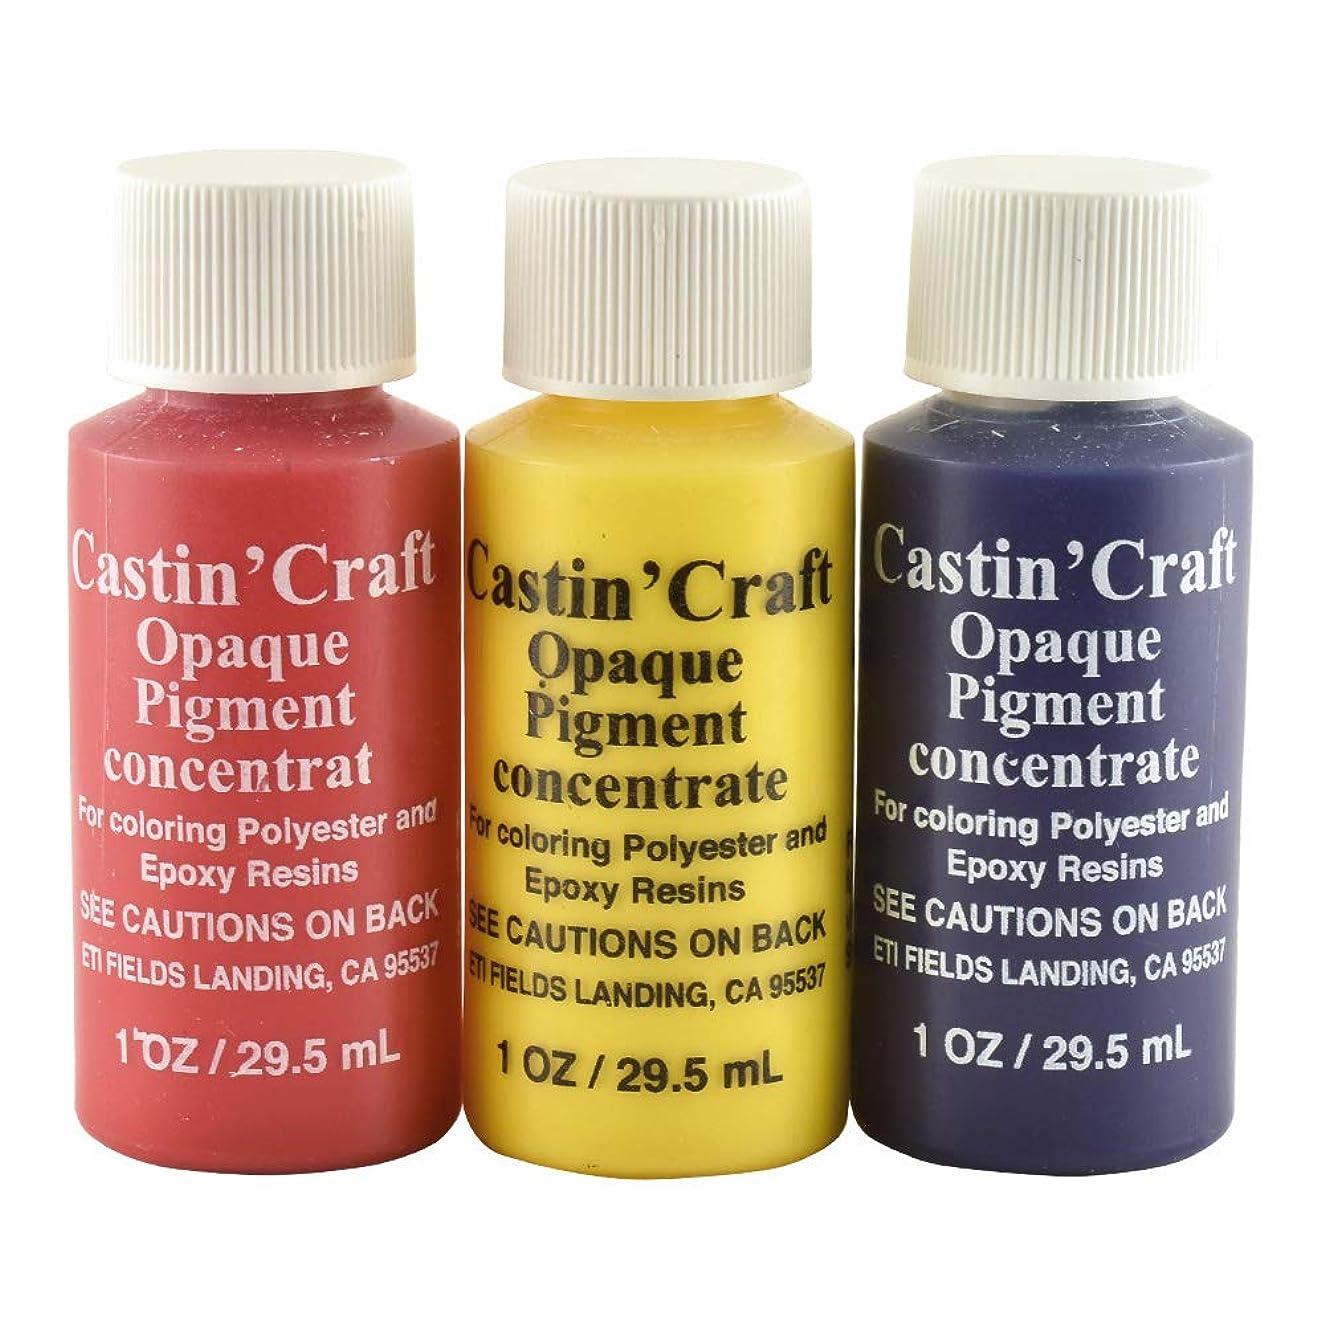 Castin' Craft 1 Oz Opaque Dye Primary Color Set